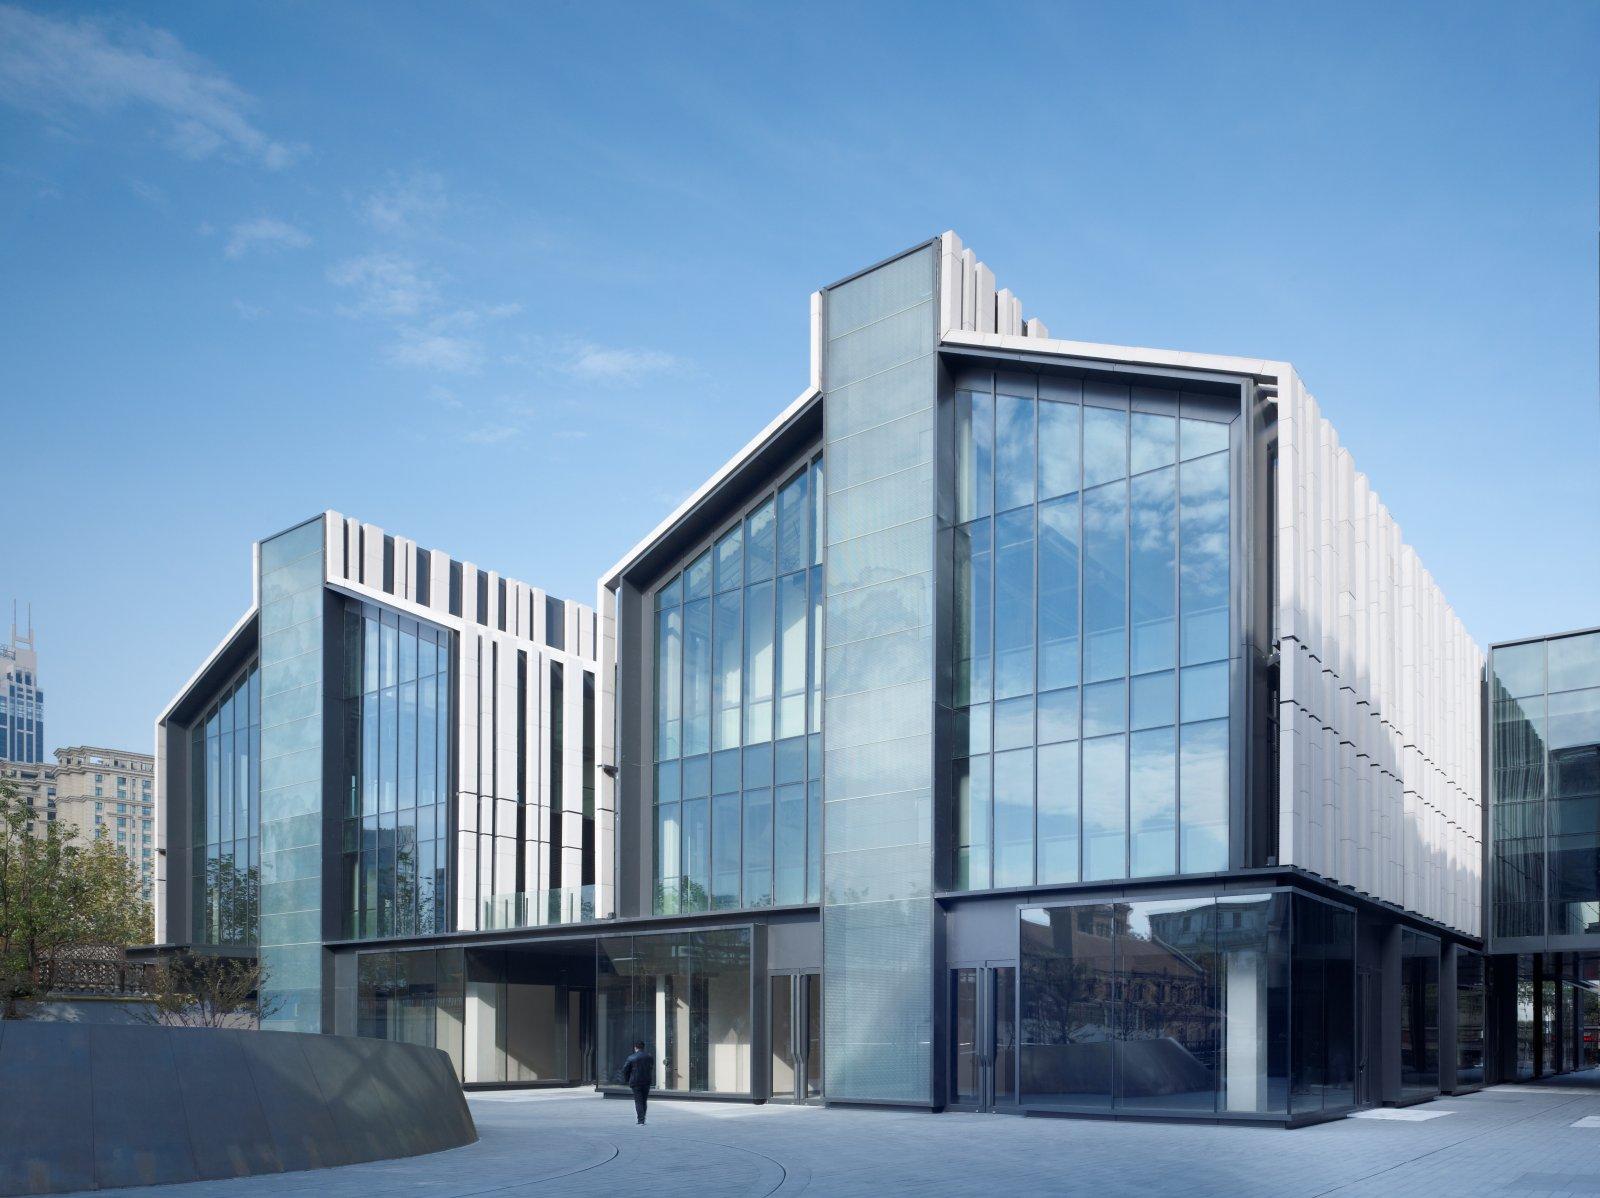 Soho fuxing lu shanghai by gmp architekten 08 a as - Gmp architektur ...